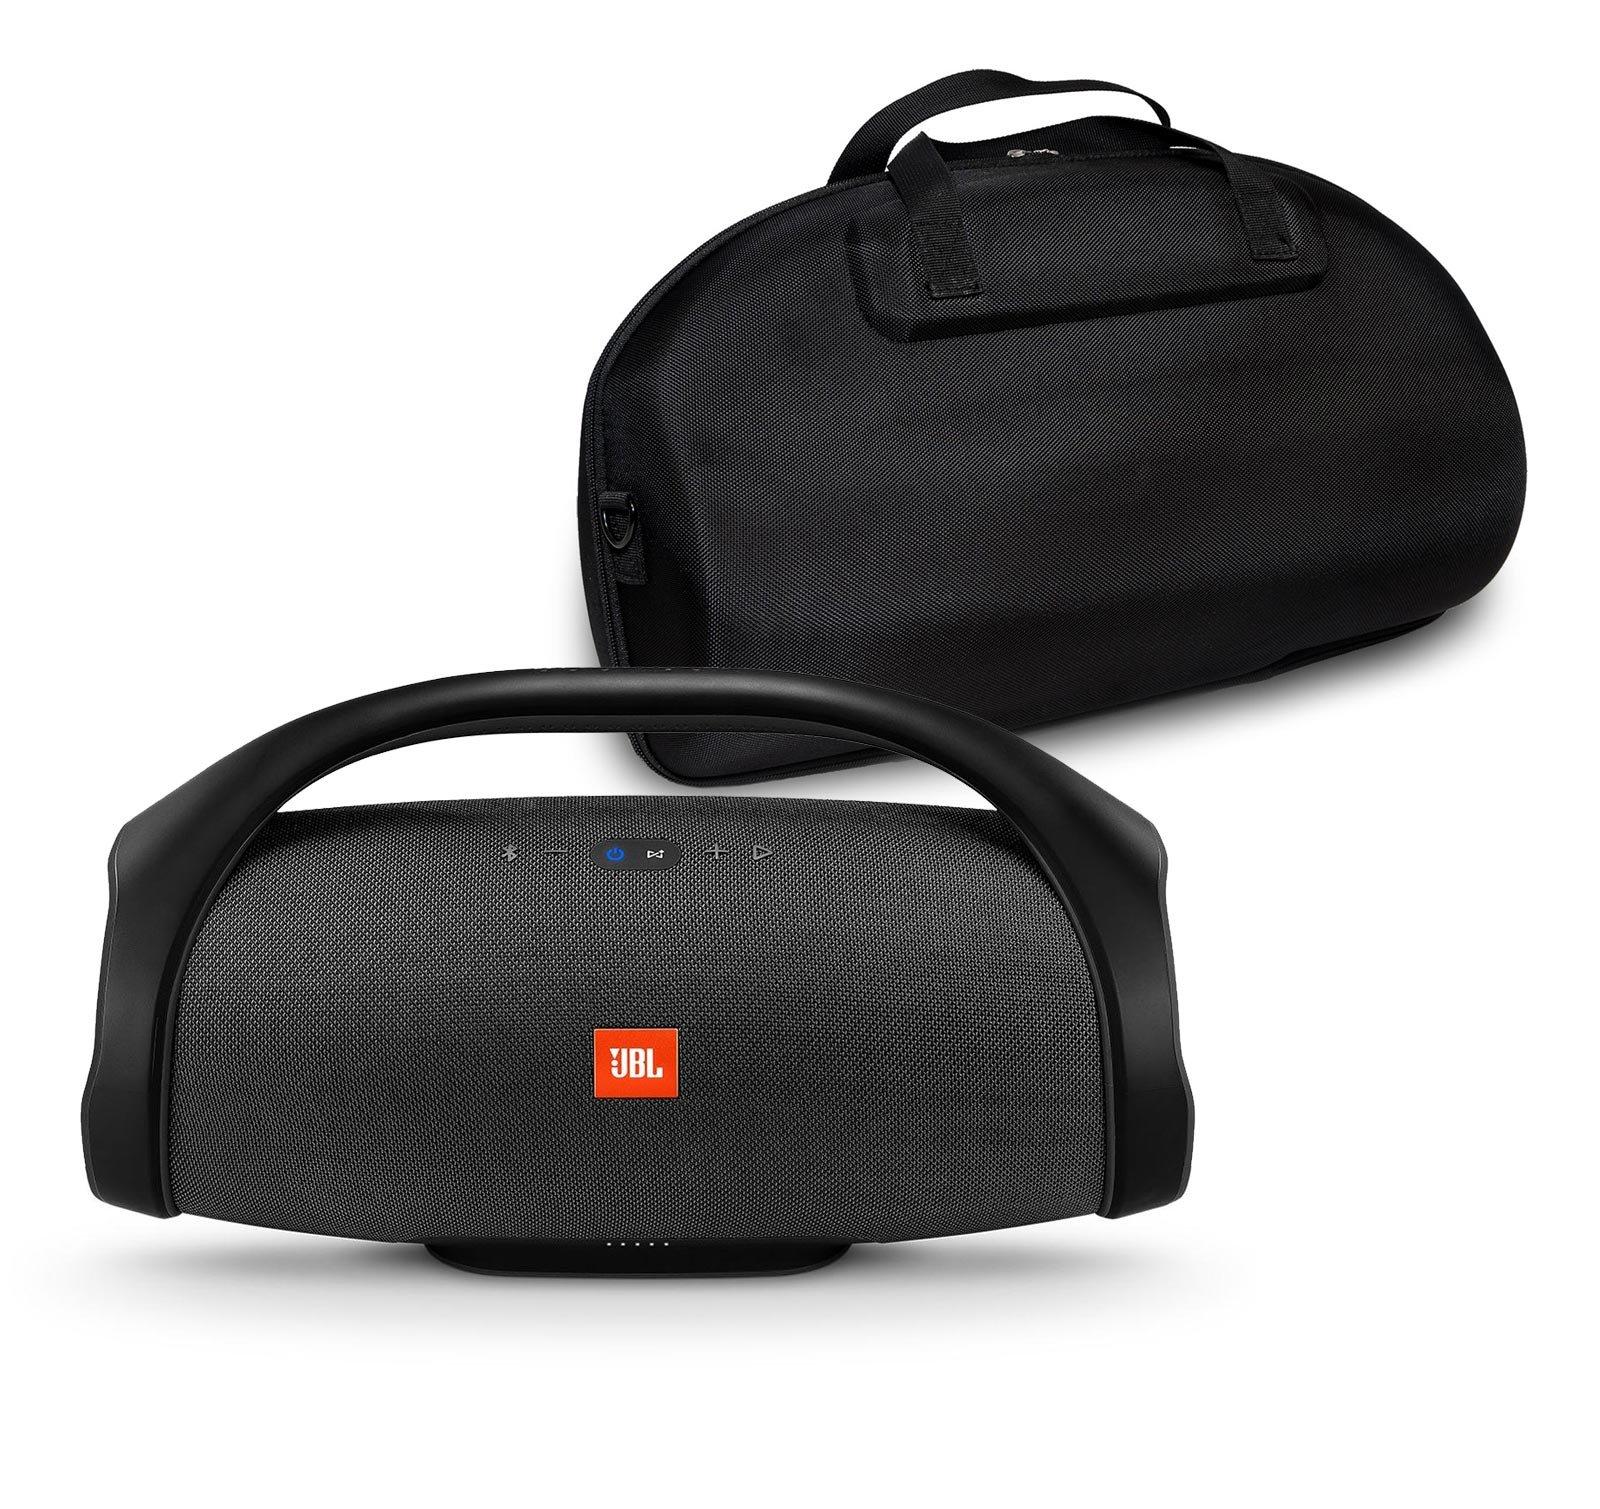 JBL Boombox Portable Bluetooth Waterproof Speaker Bundle with Hardshell Storage Case (Black) by JBL (Image #1)